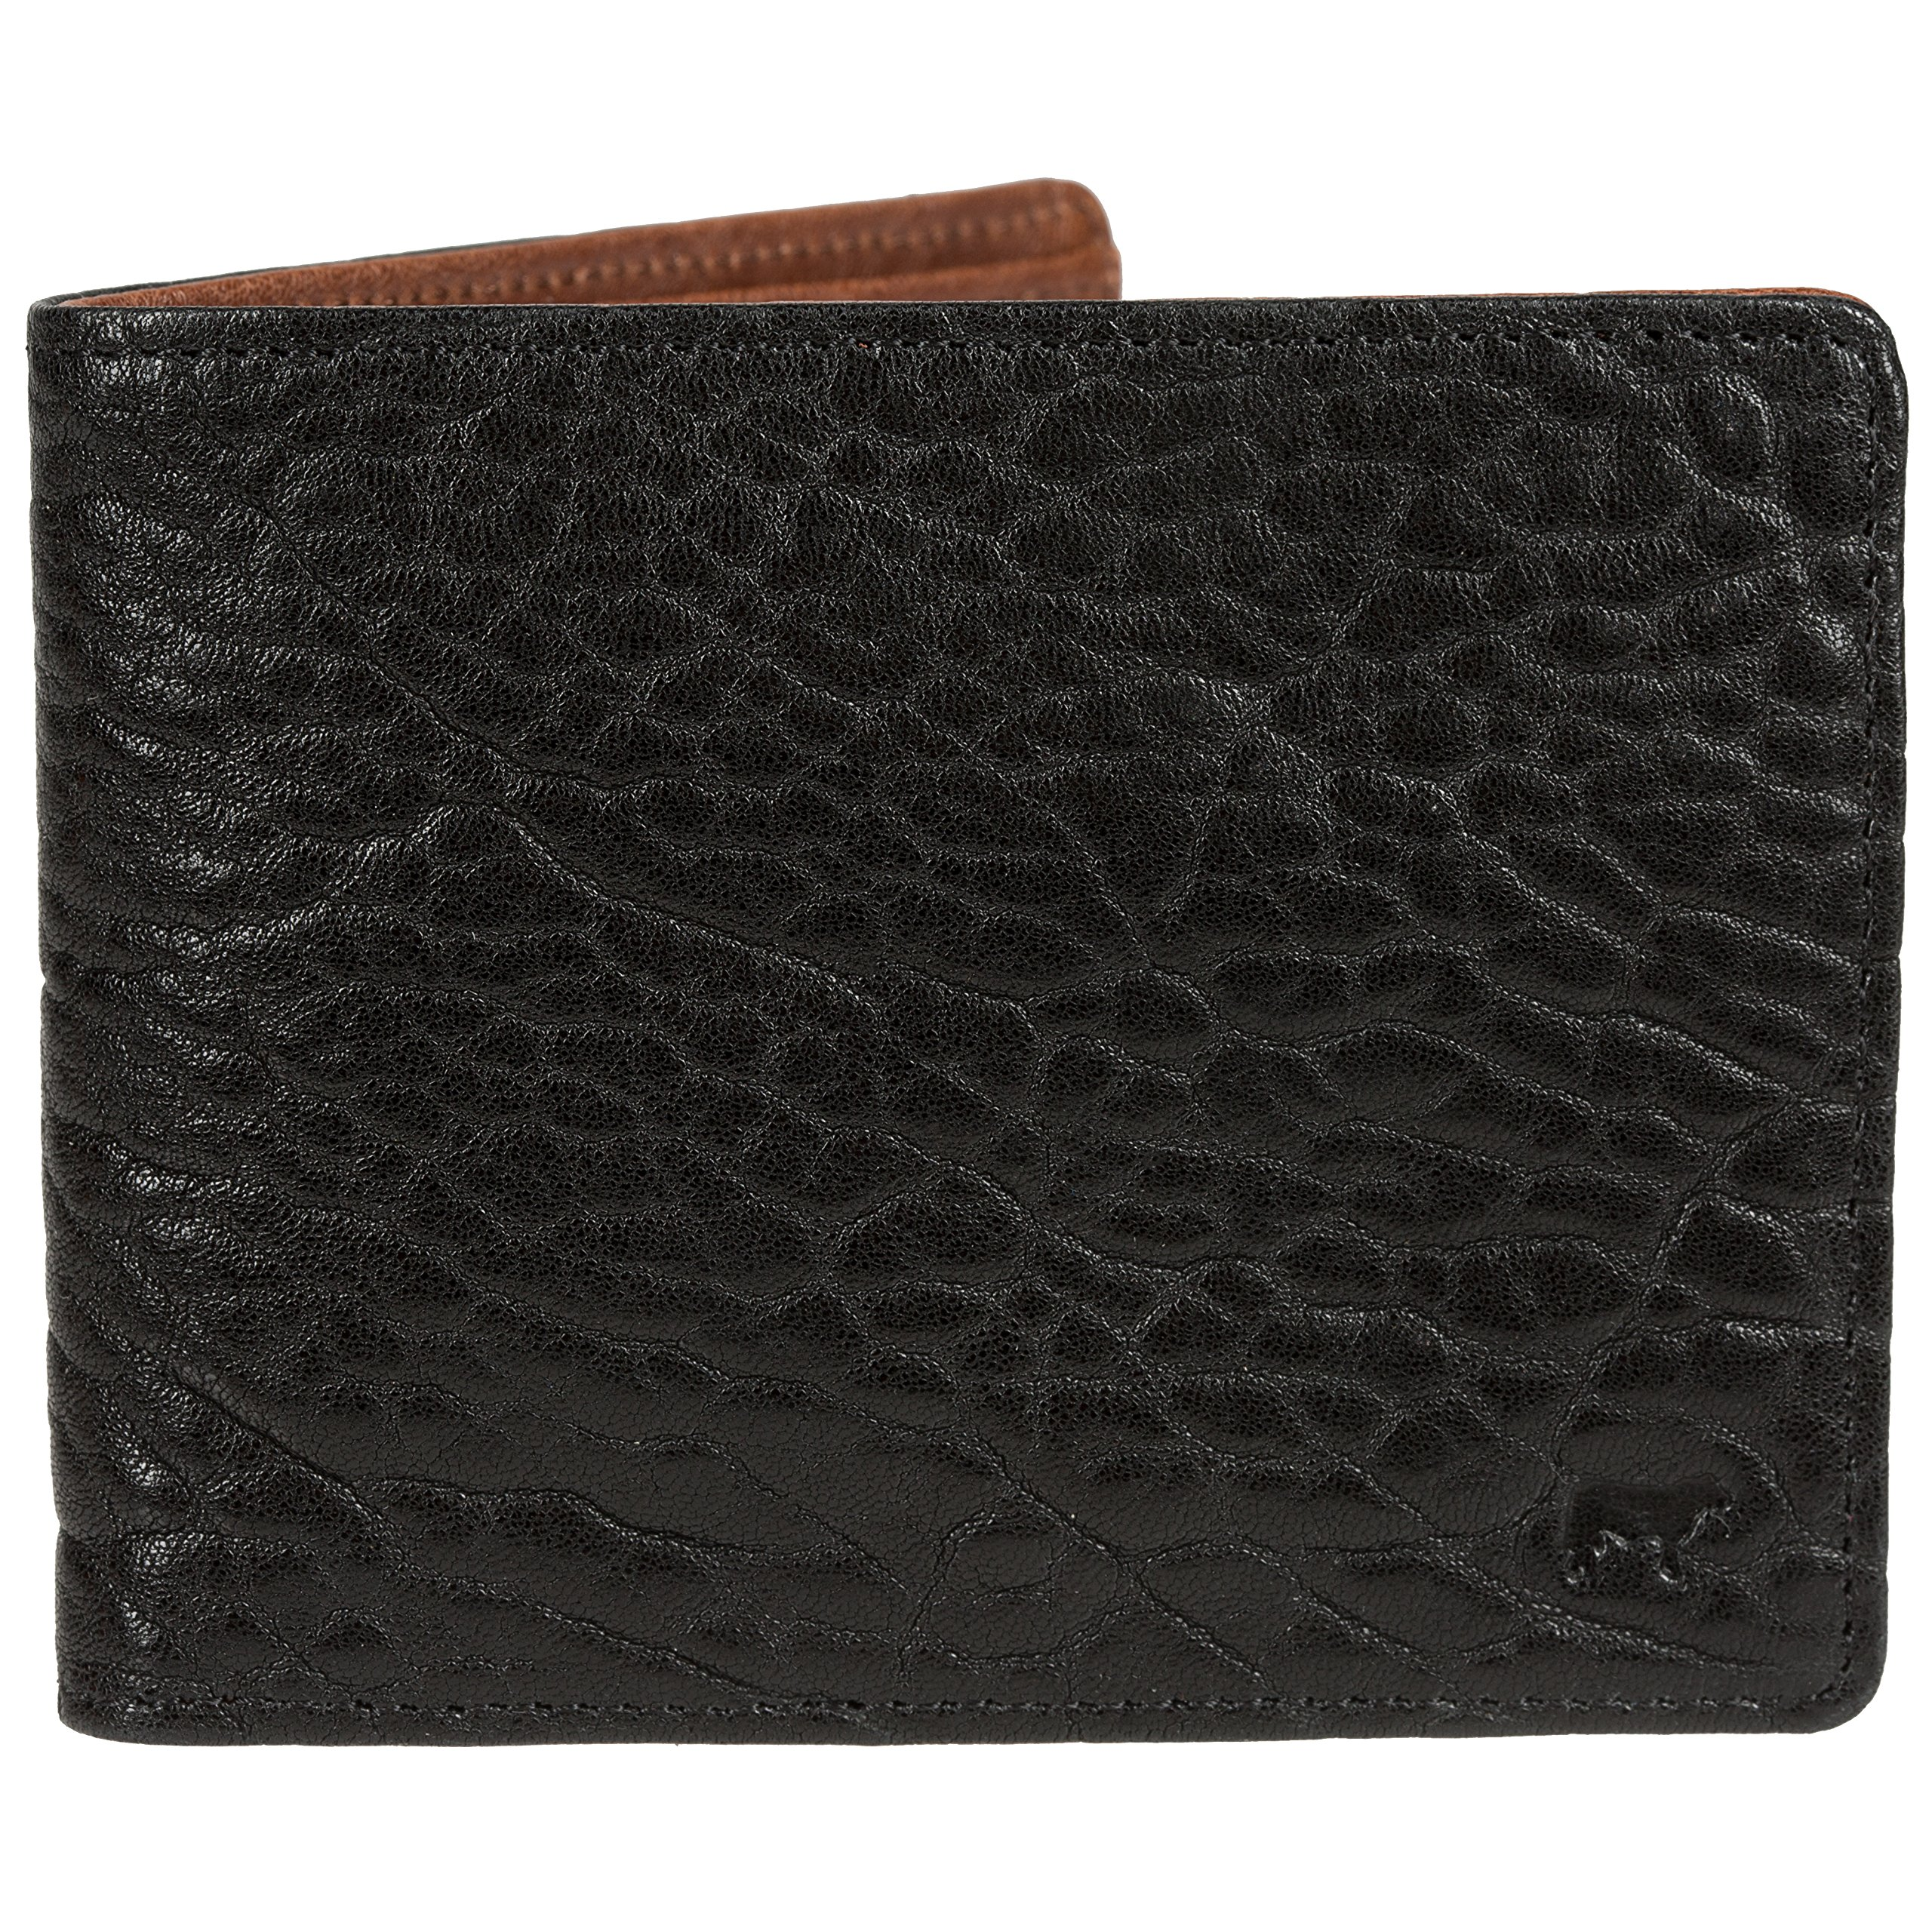 Will Leather Goods Marvel Italian Lambskin Billfold, 4.5'' x 3.5'' - Black/Cognac